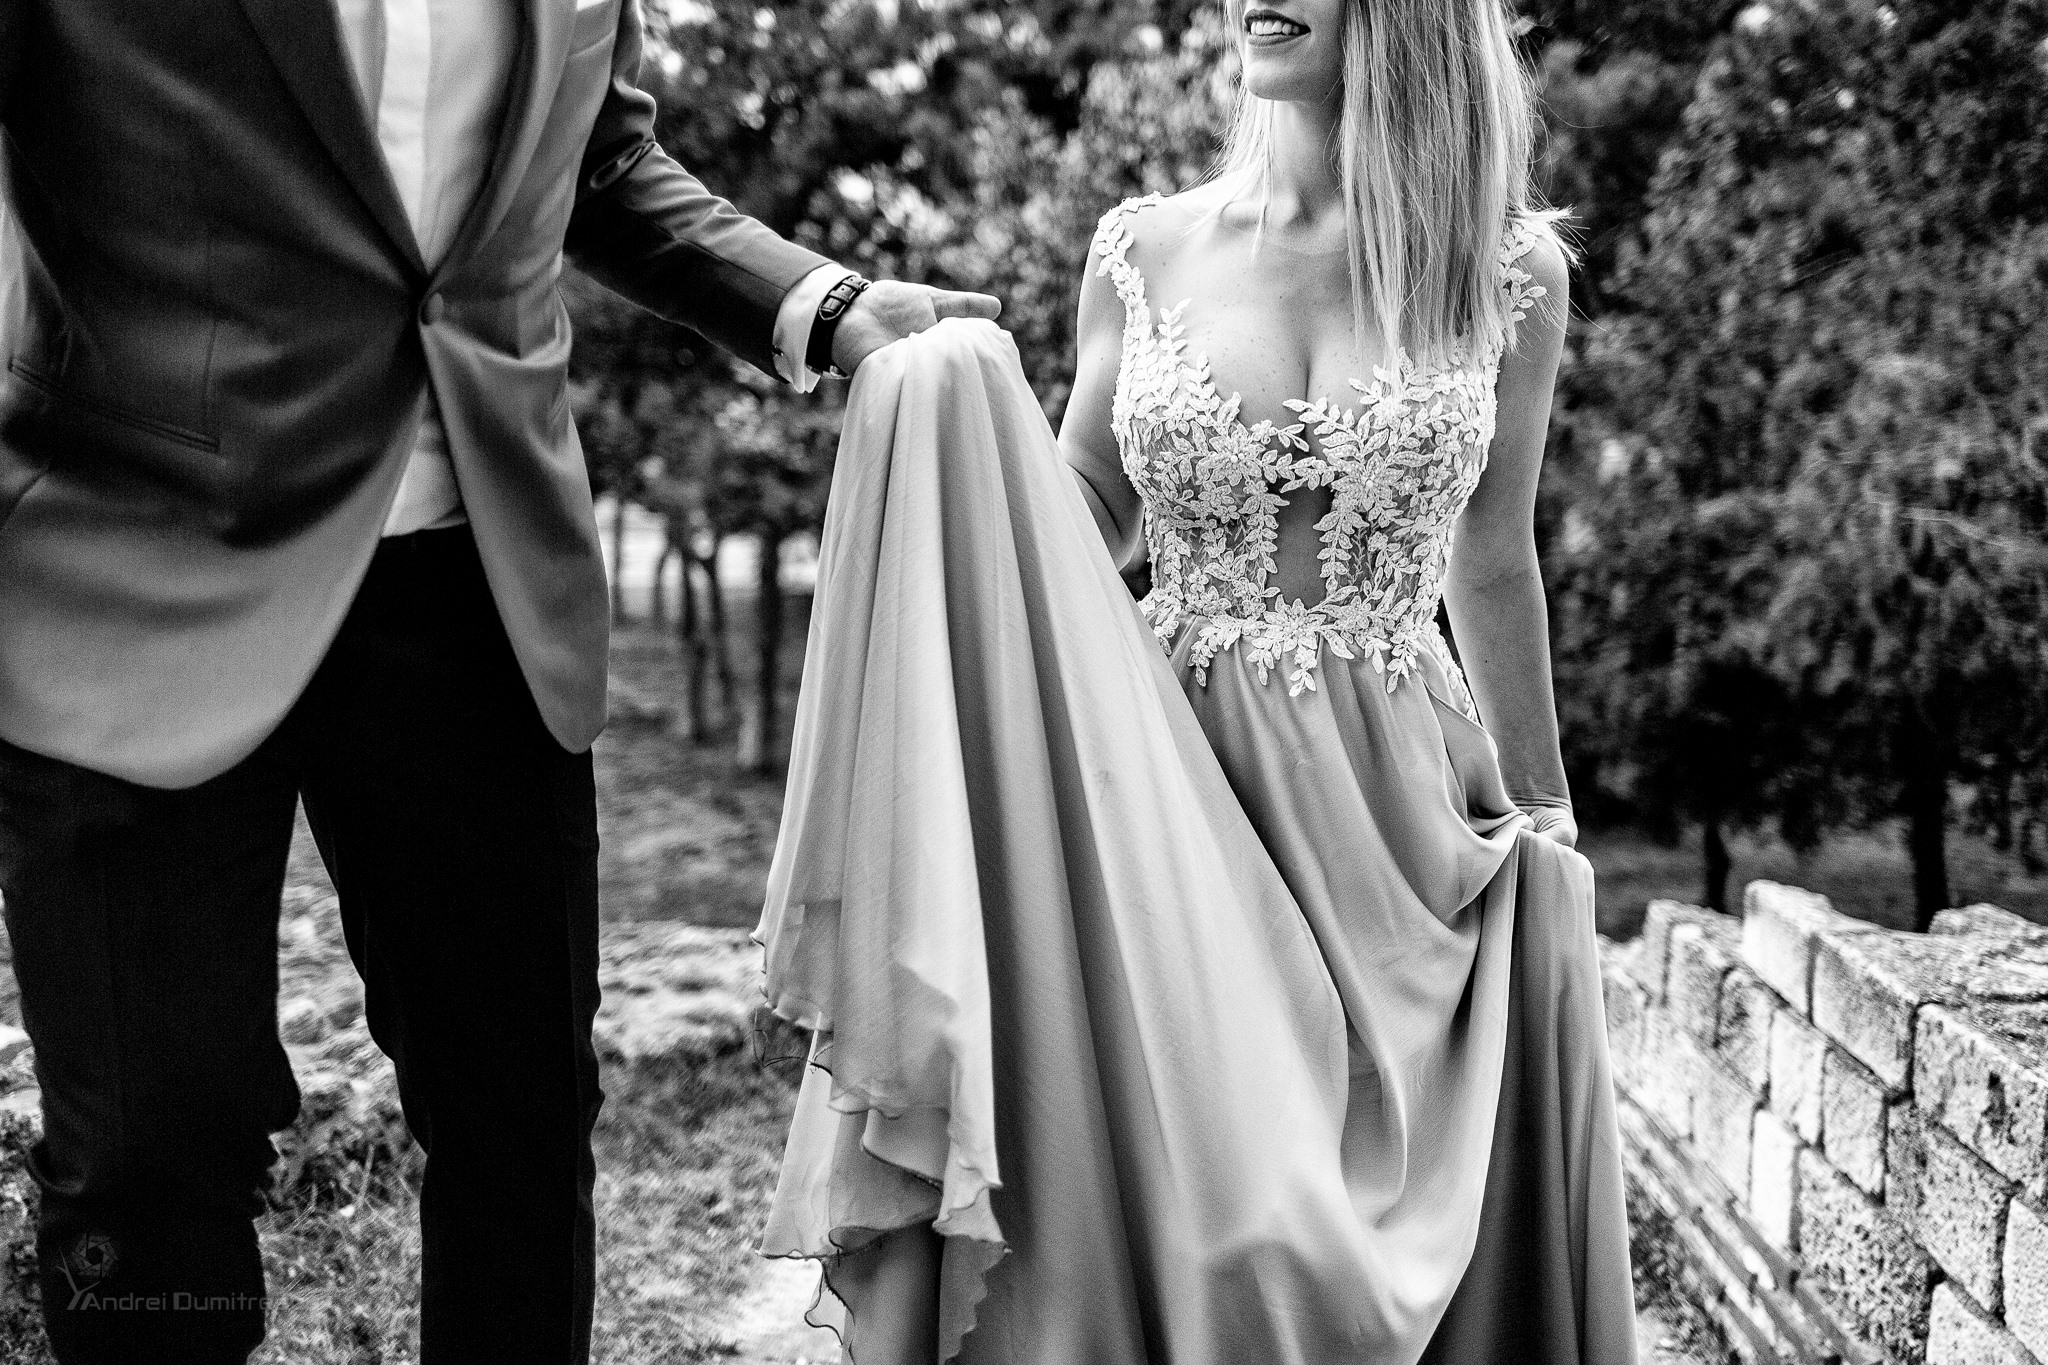 Andrei Dumitrescu - selectie de 5 fotografii de nunta